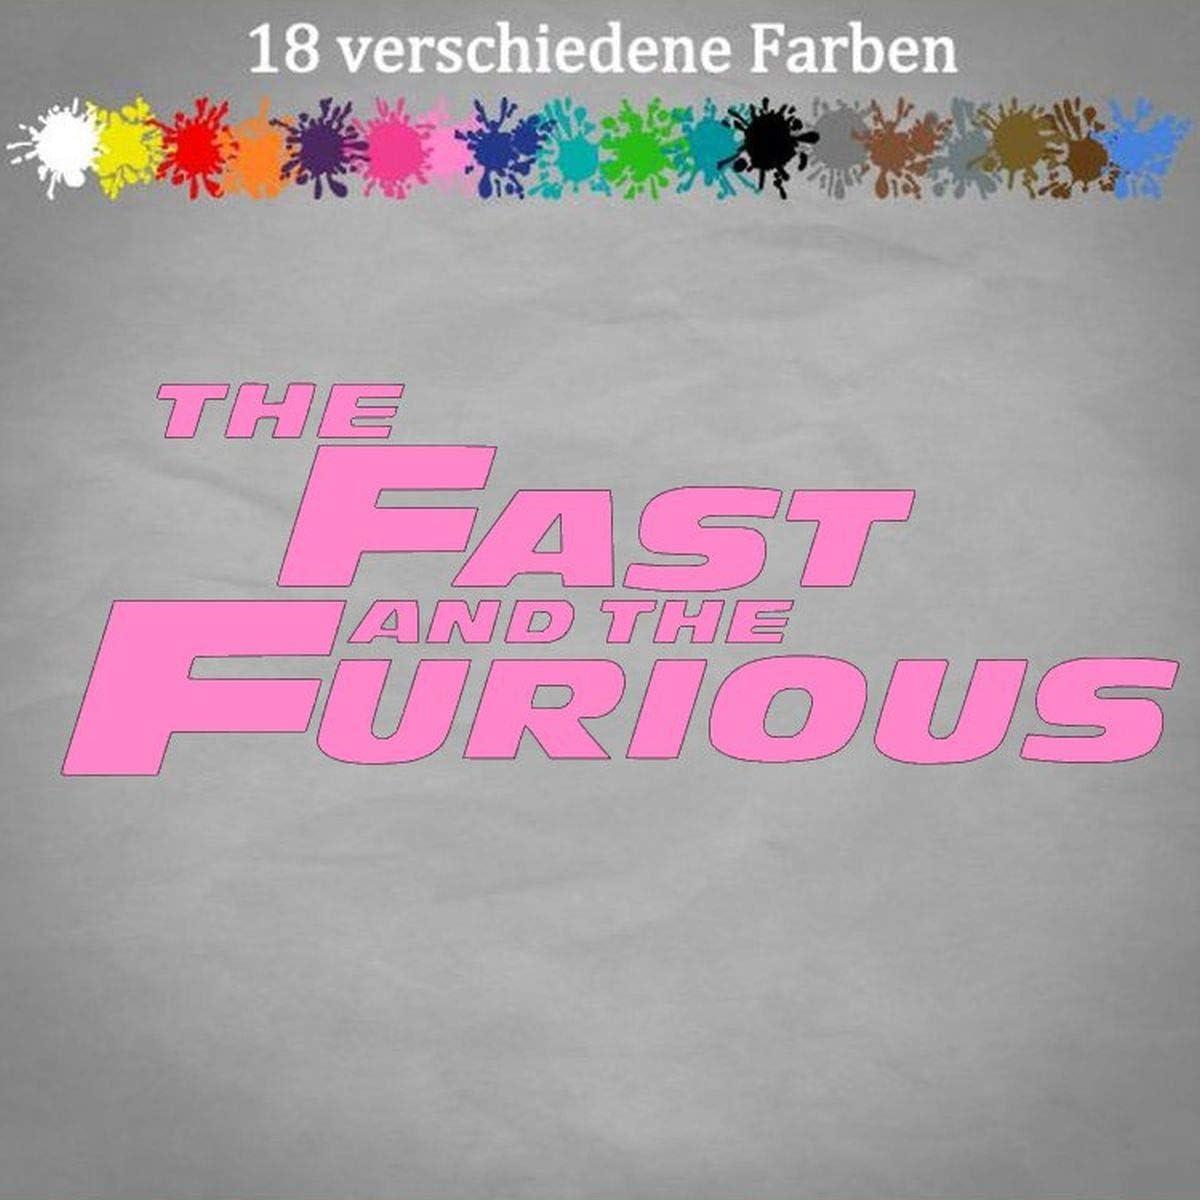 20 x 7 cm Generic Fast and Furious Pegatina para port/átiles dise/ño de Paul Walker